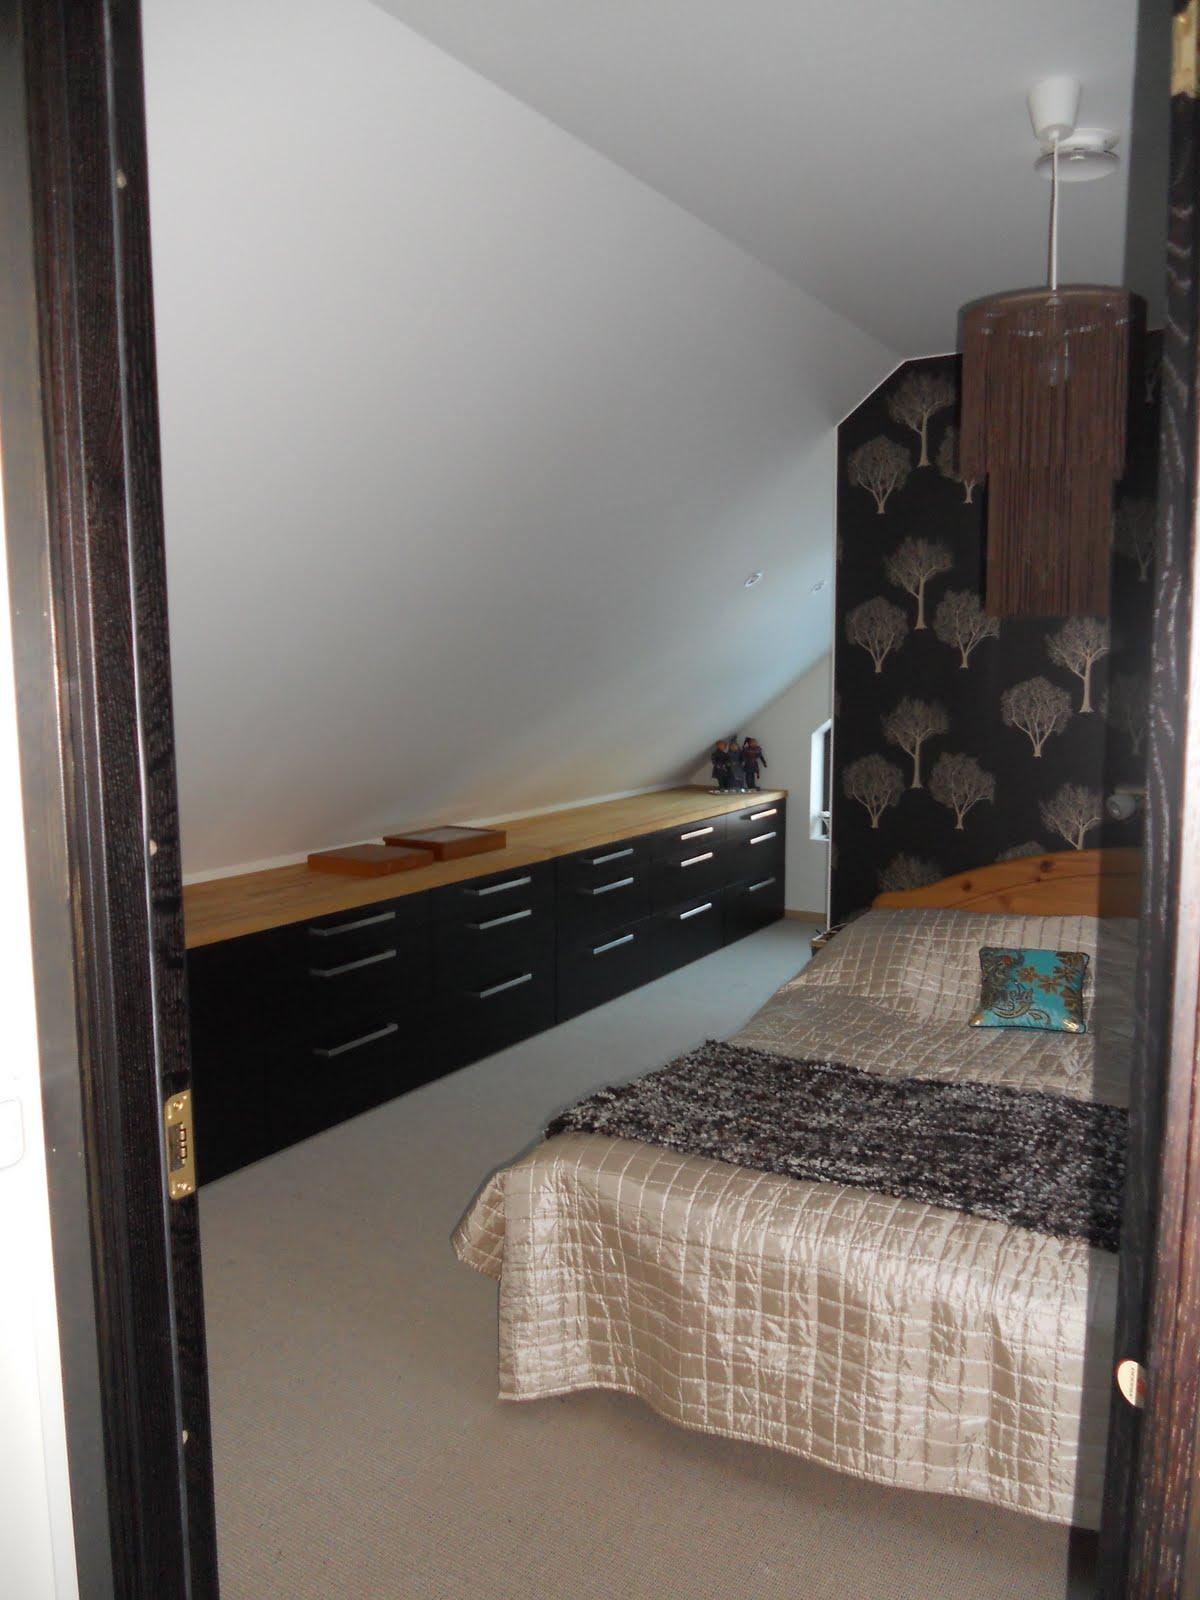 Kitchen cabinets in bedroom - IKEA Hackers